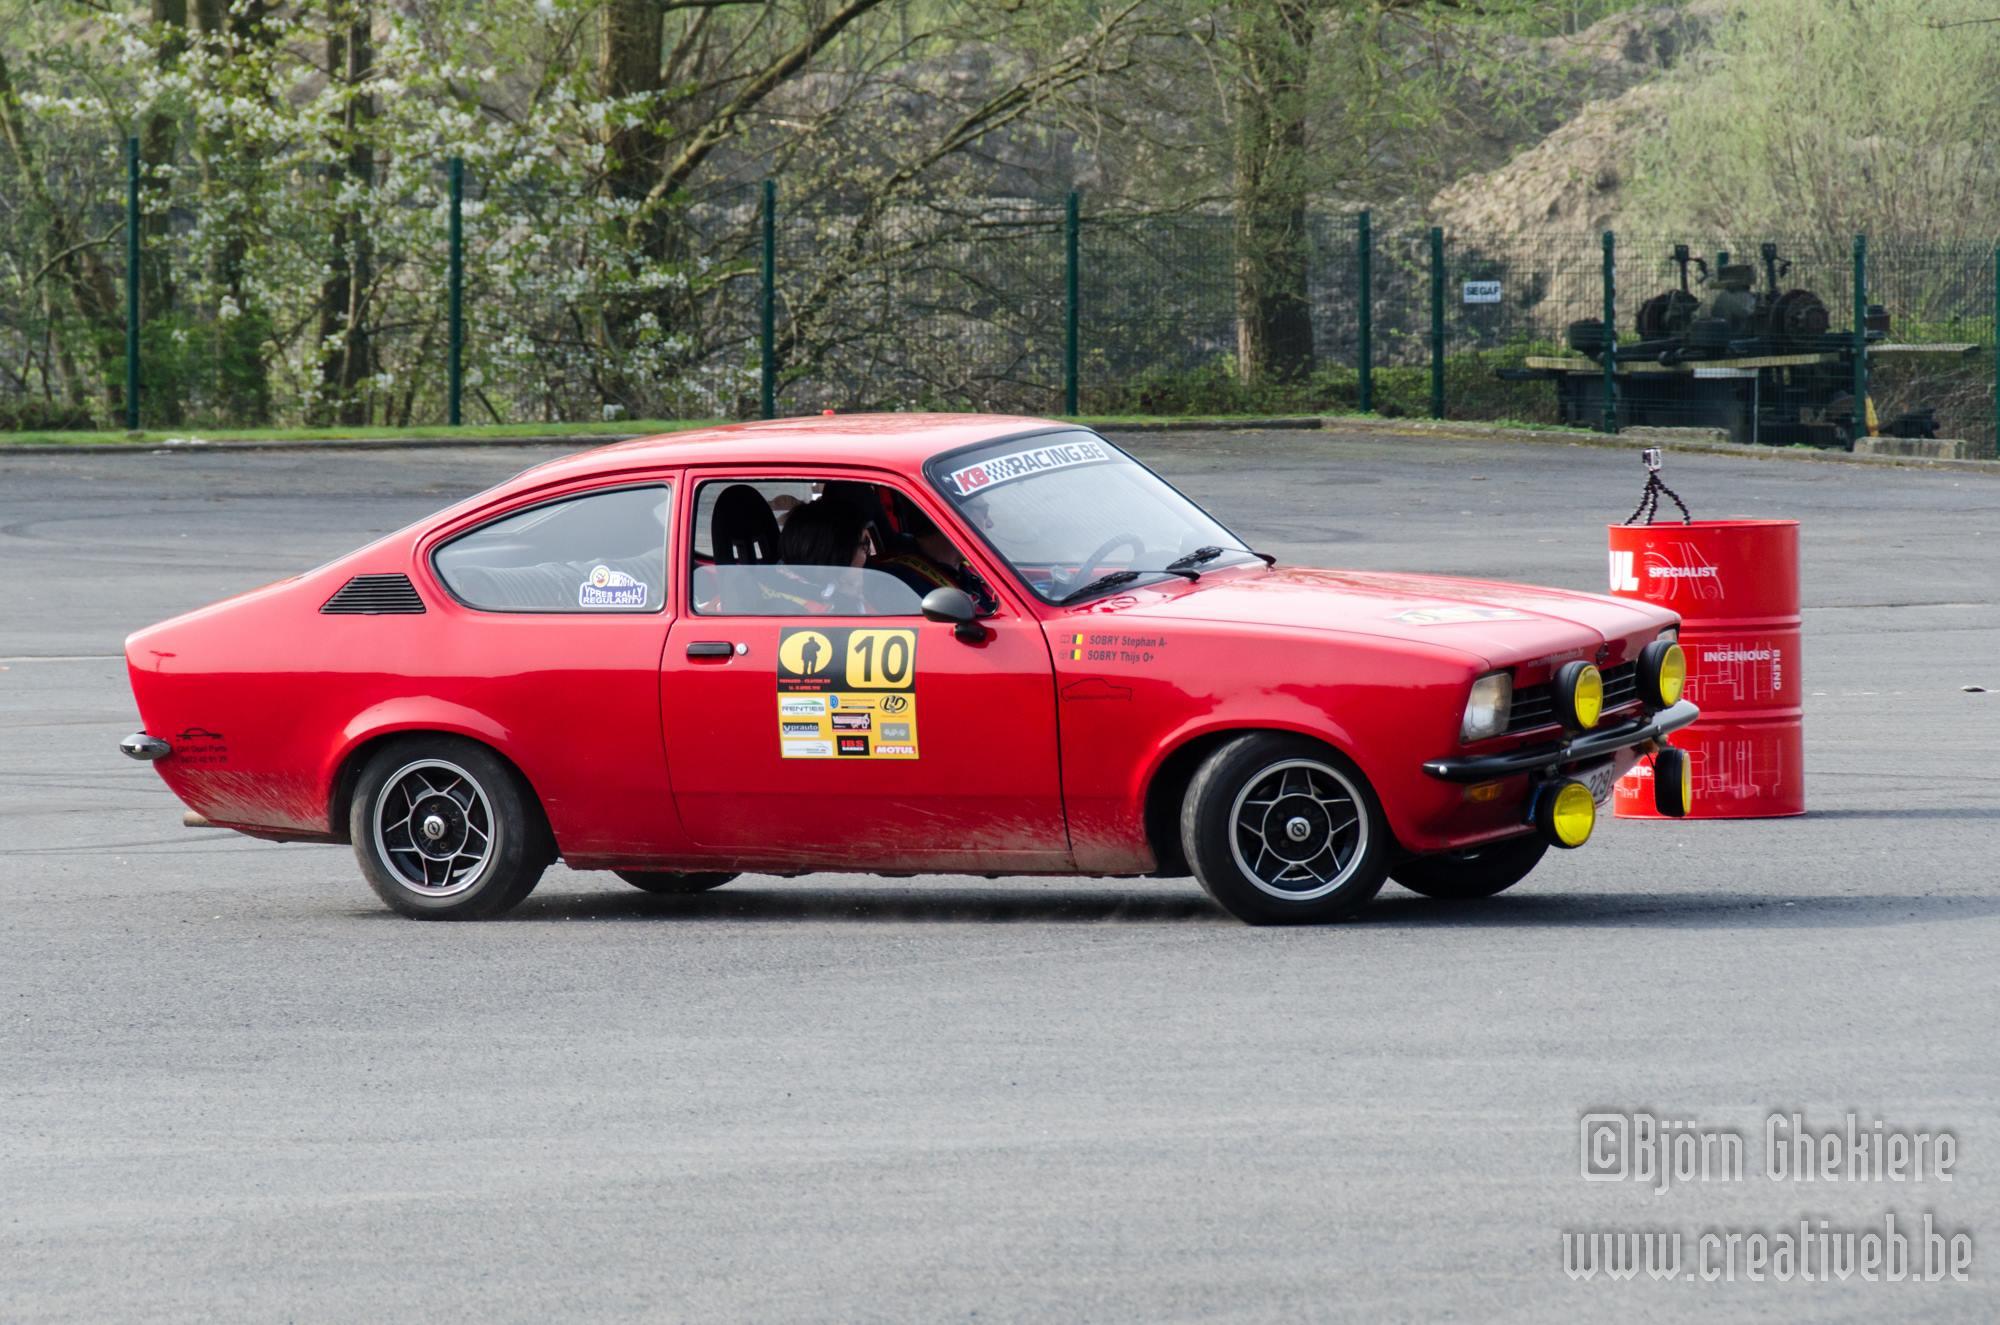 1001 - Opel - Kadett C1 - 1977